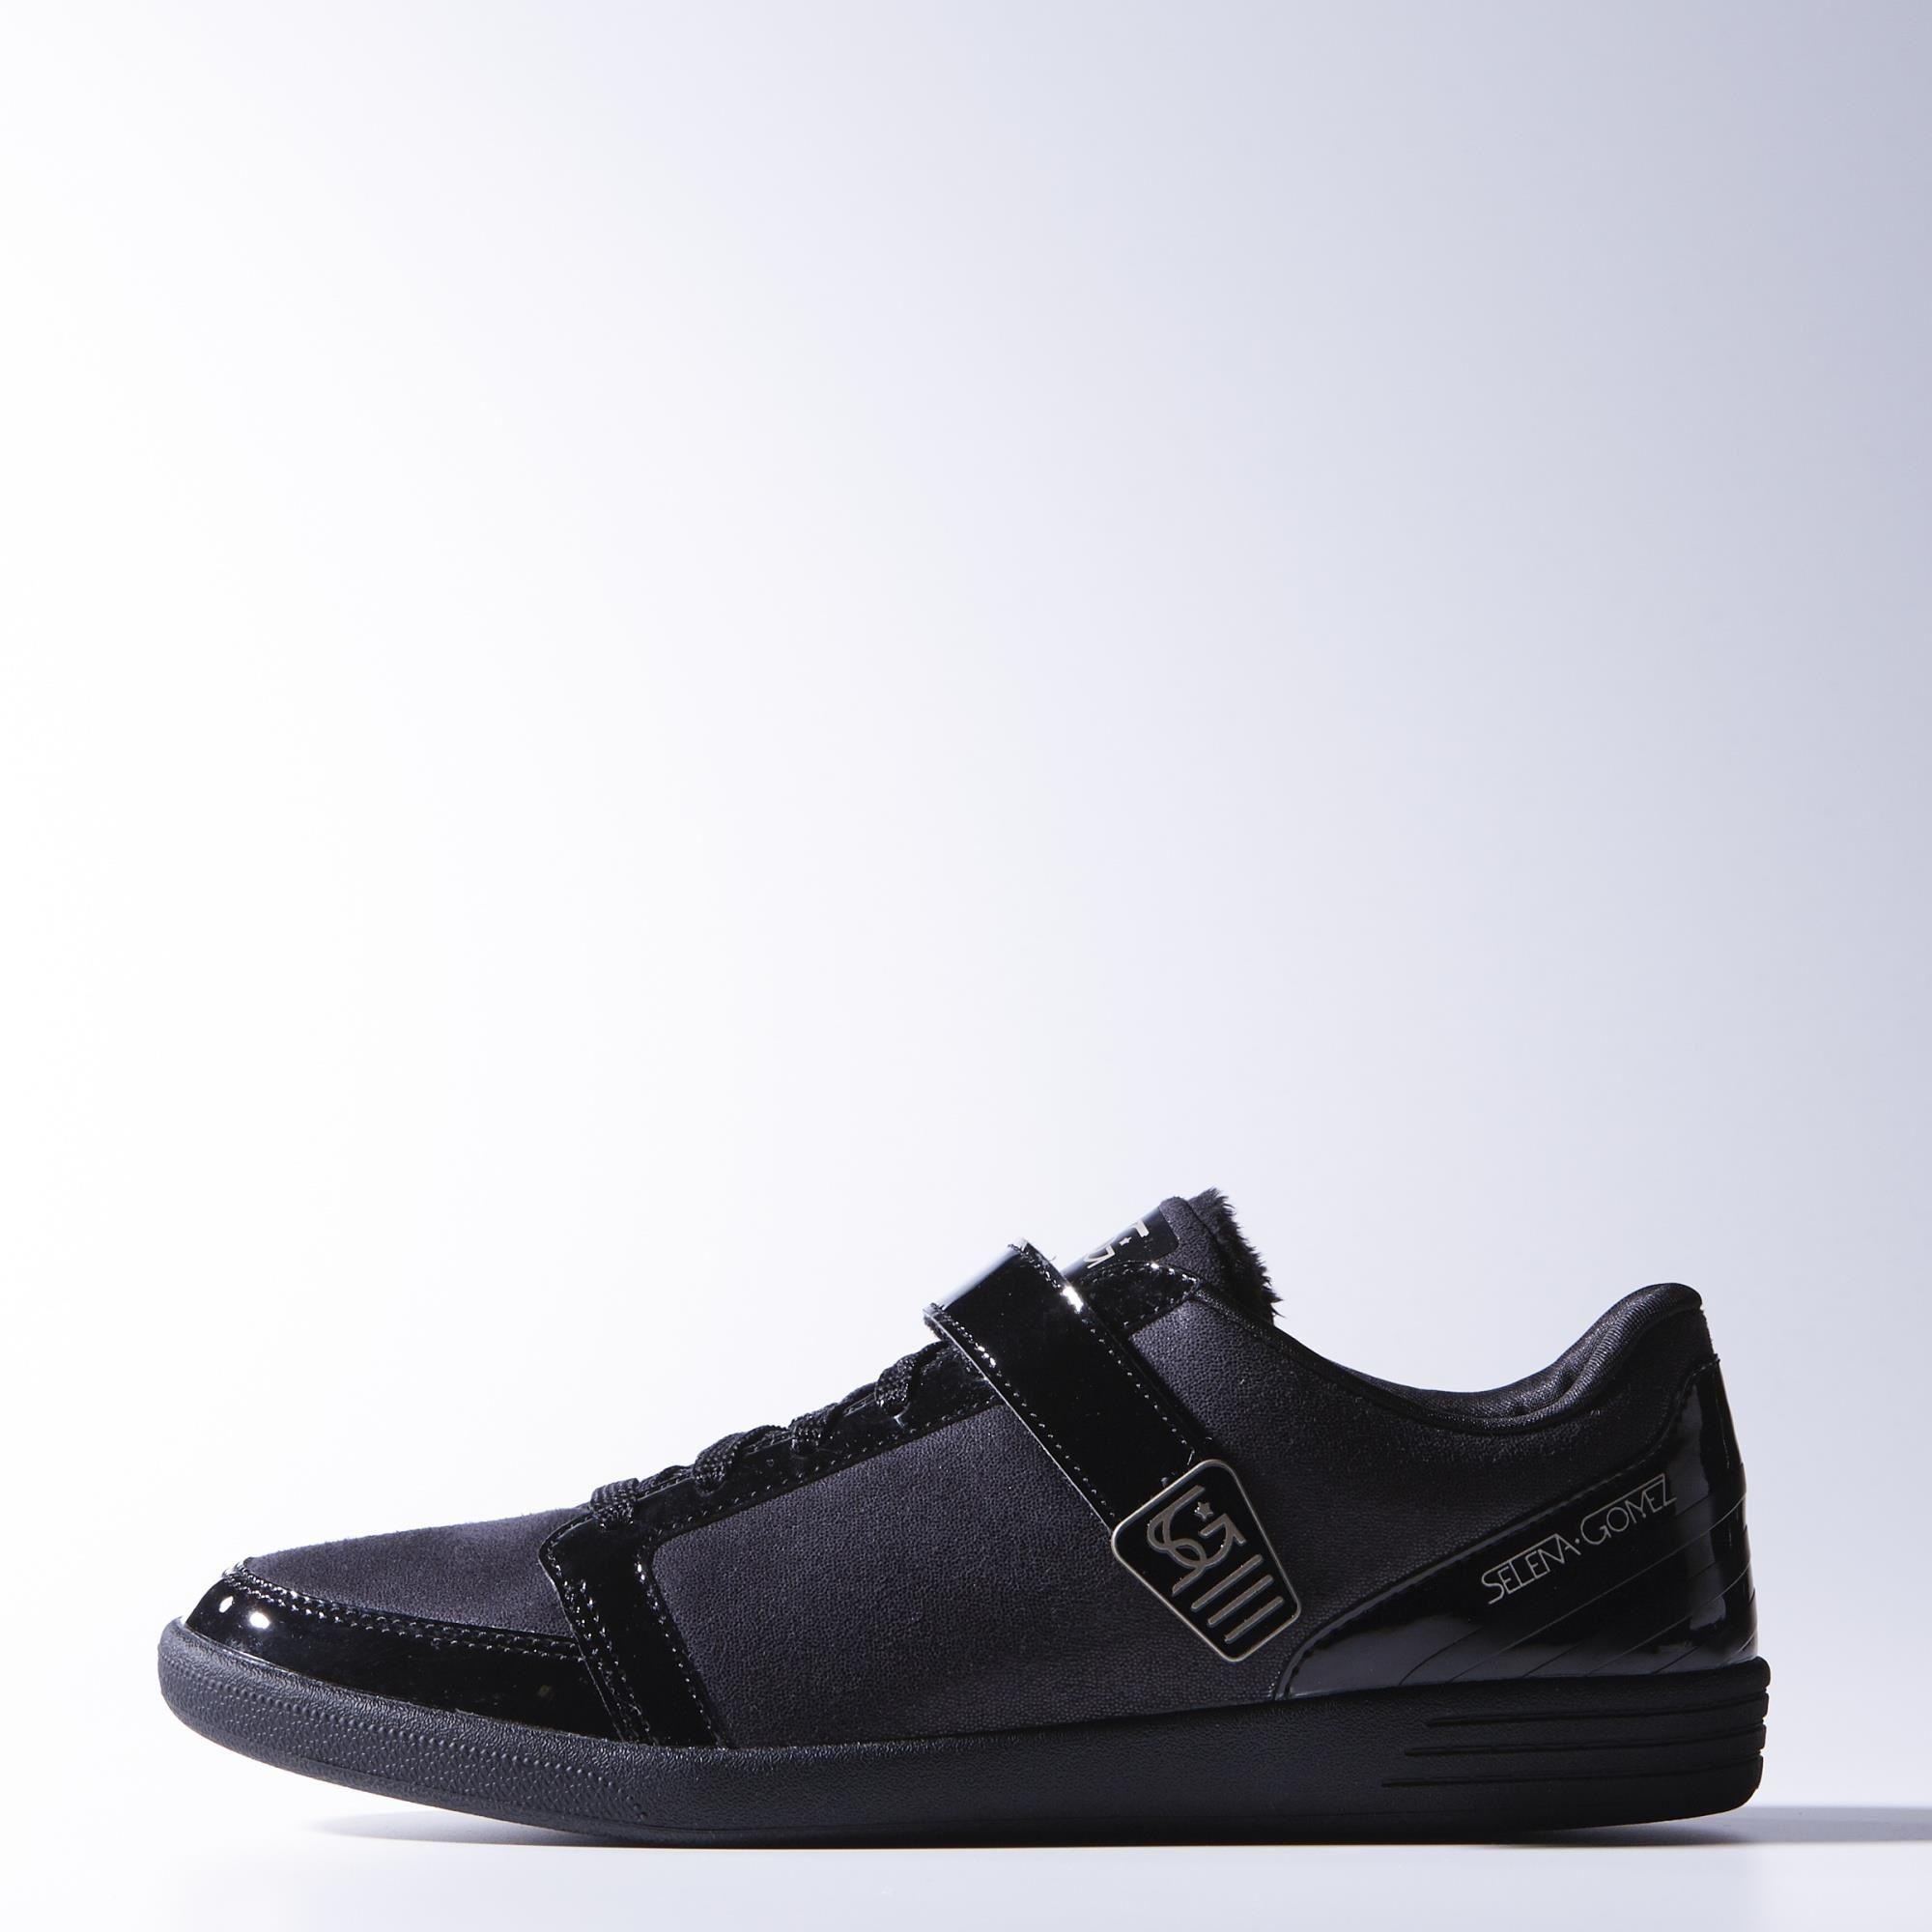 Selena Gomez Baseline Hook Low Shoes adidas | adidas France